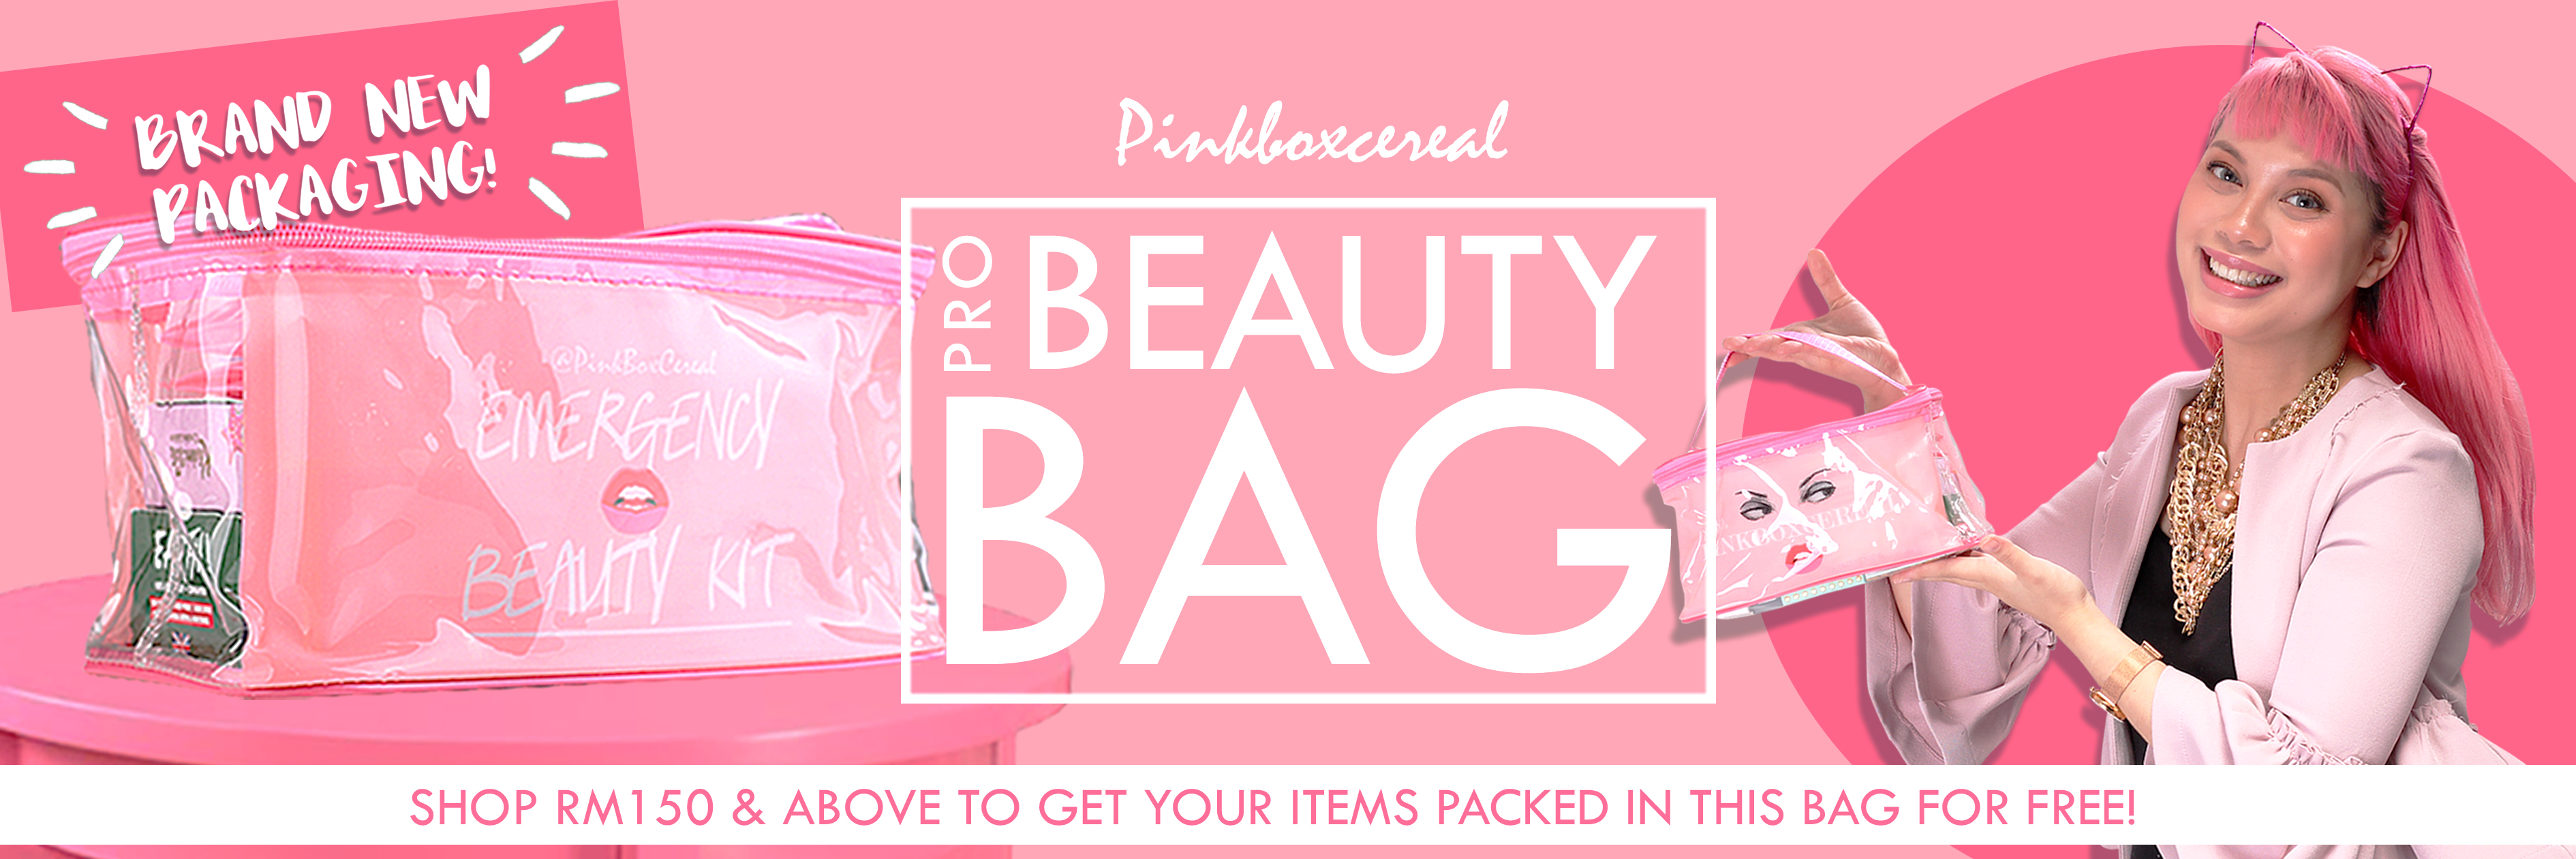 New PBC Pro Beauty Bag-Website Banner.jpg